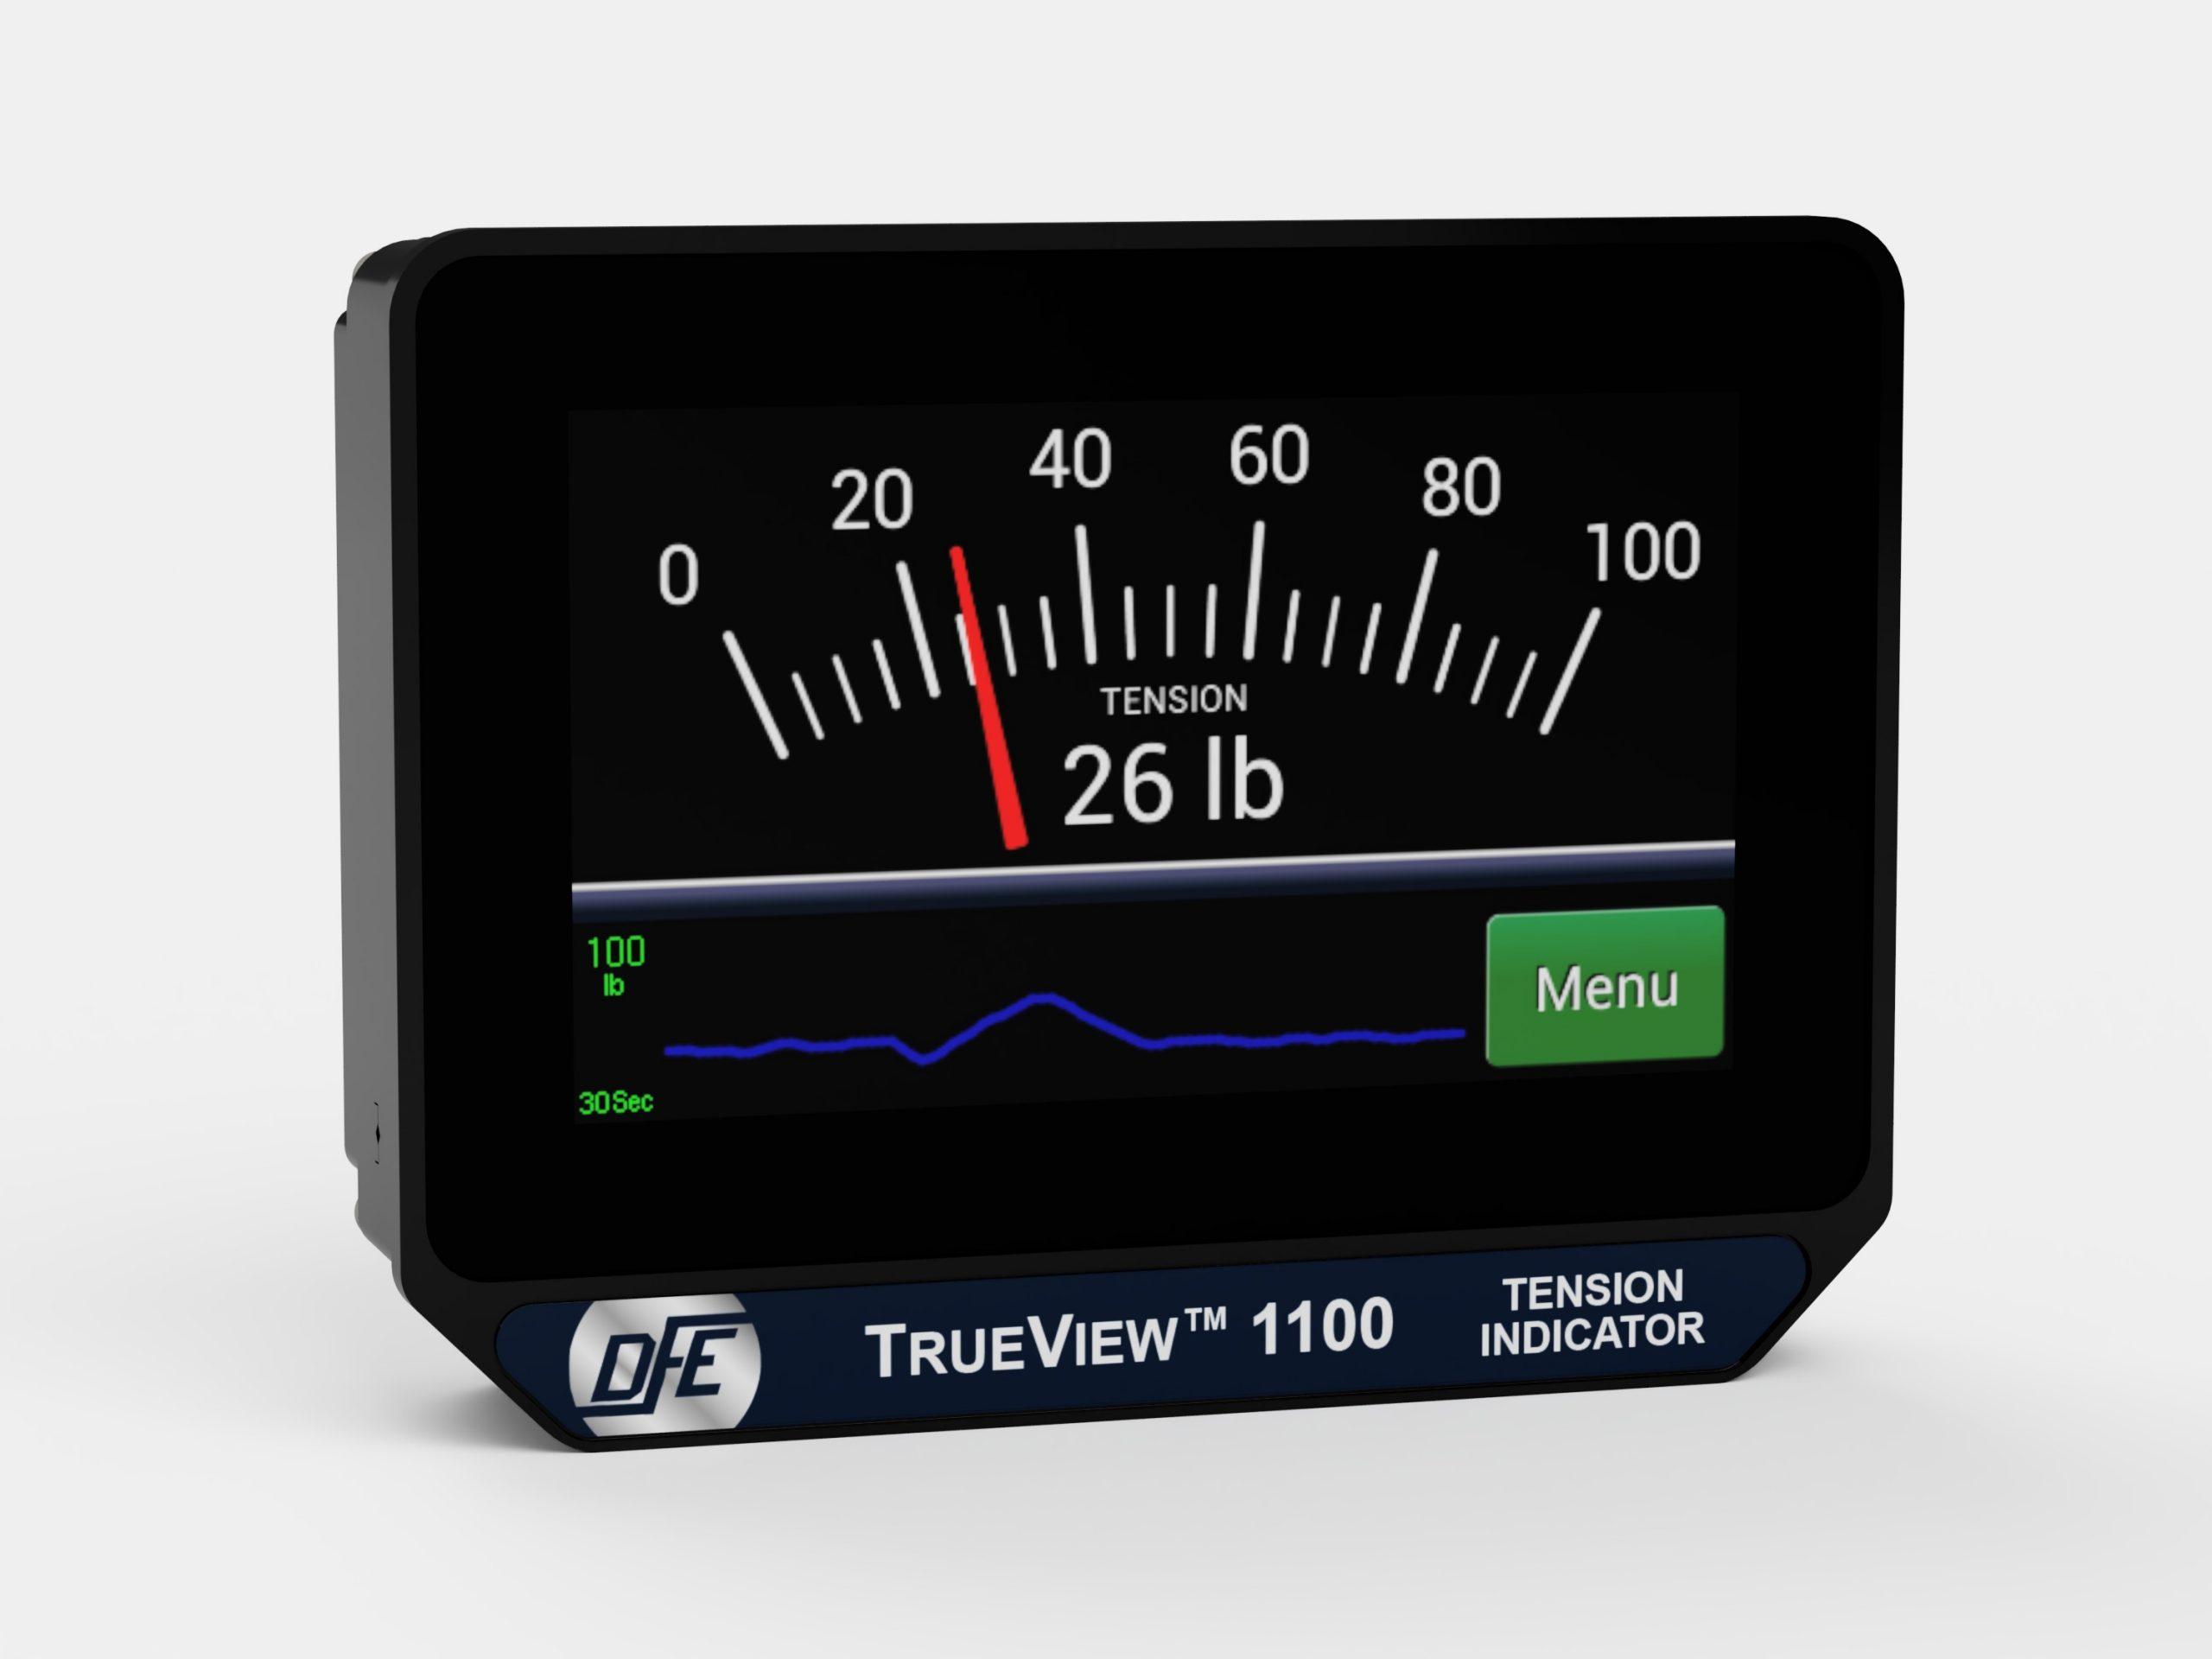 TrueView 1100 Tension Indicator